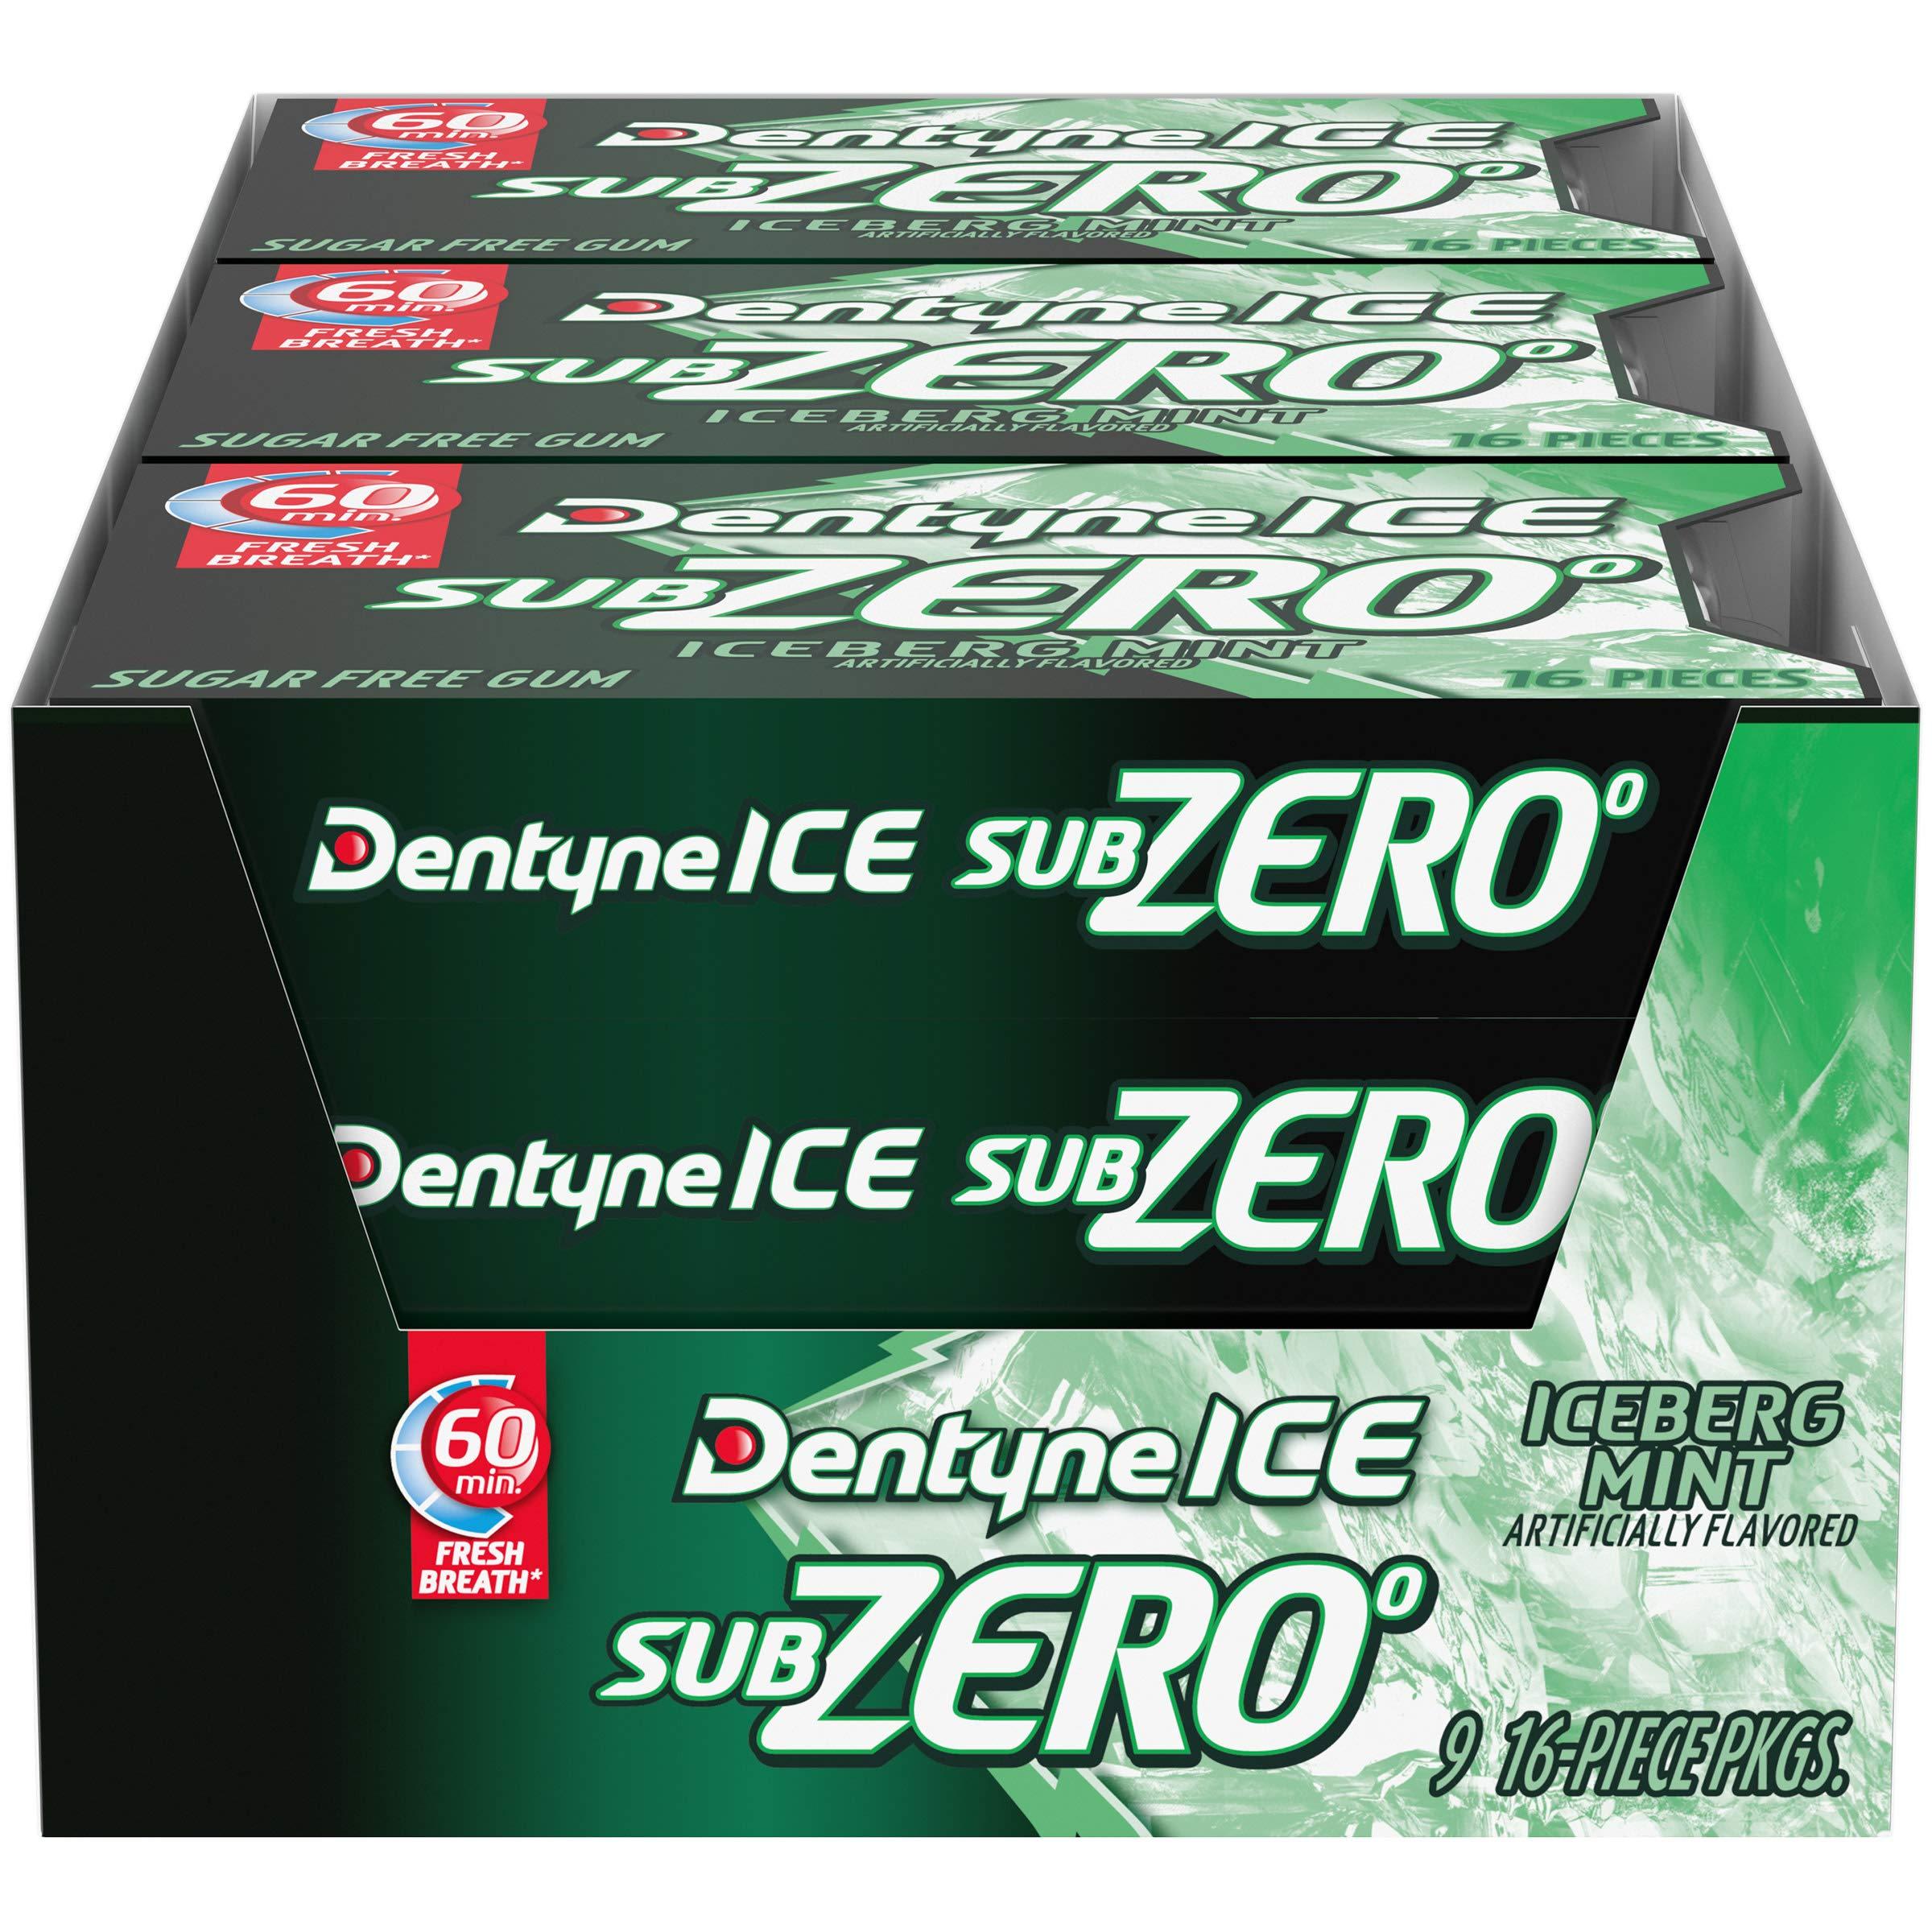 Iceberg Mint Dentyne Ice Sub Zero Gum, nine 16Piece Pack (144 totalPiece)